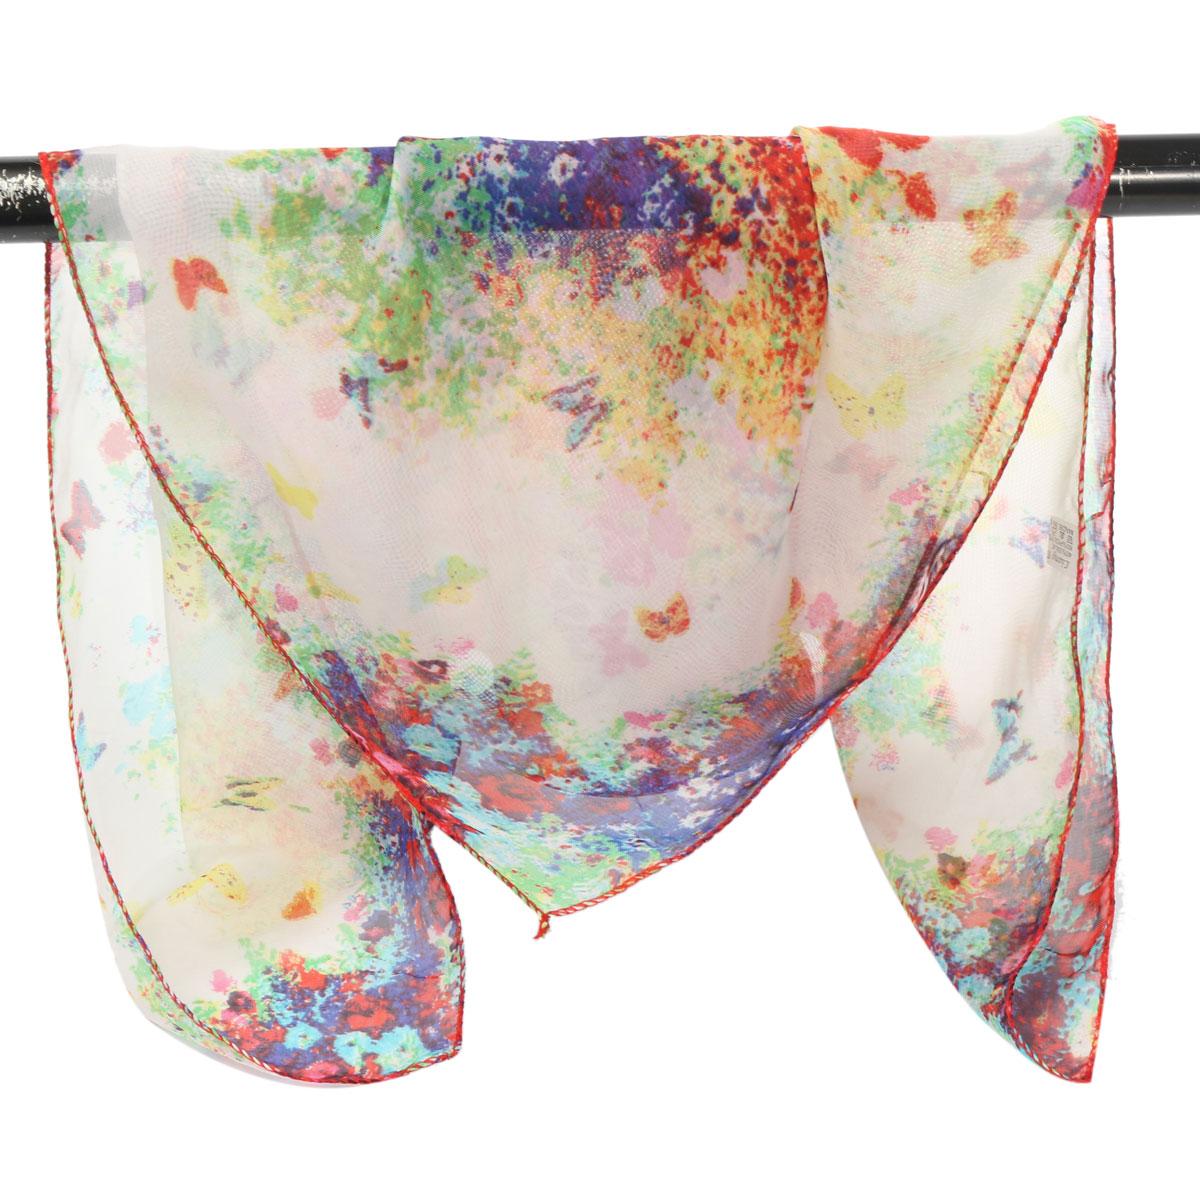 60x60cm Women Soft Flower Chiffon Small Square Scarf Scarves Bandanas Neck Accessories